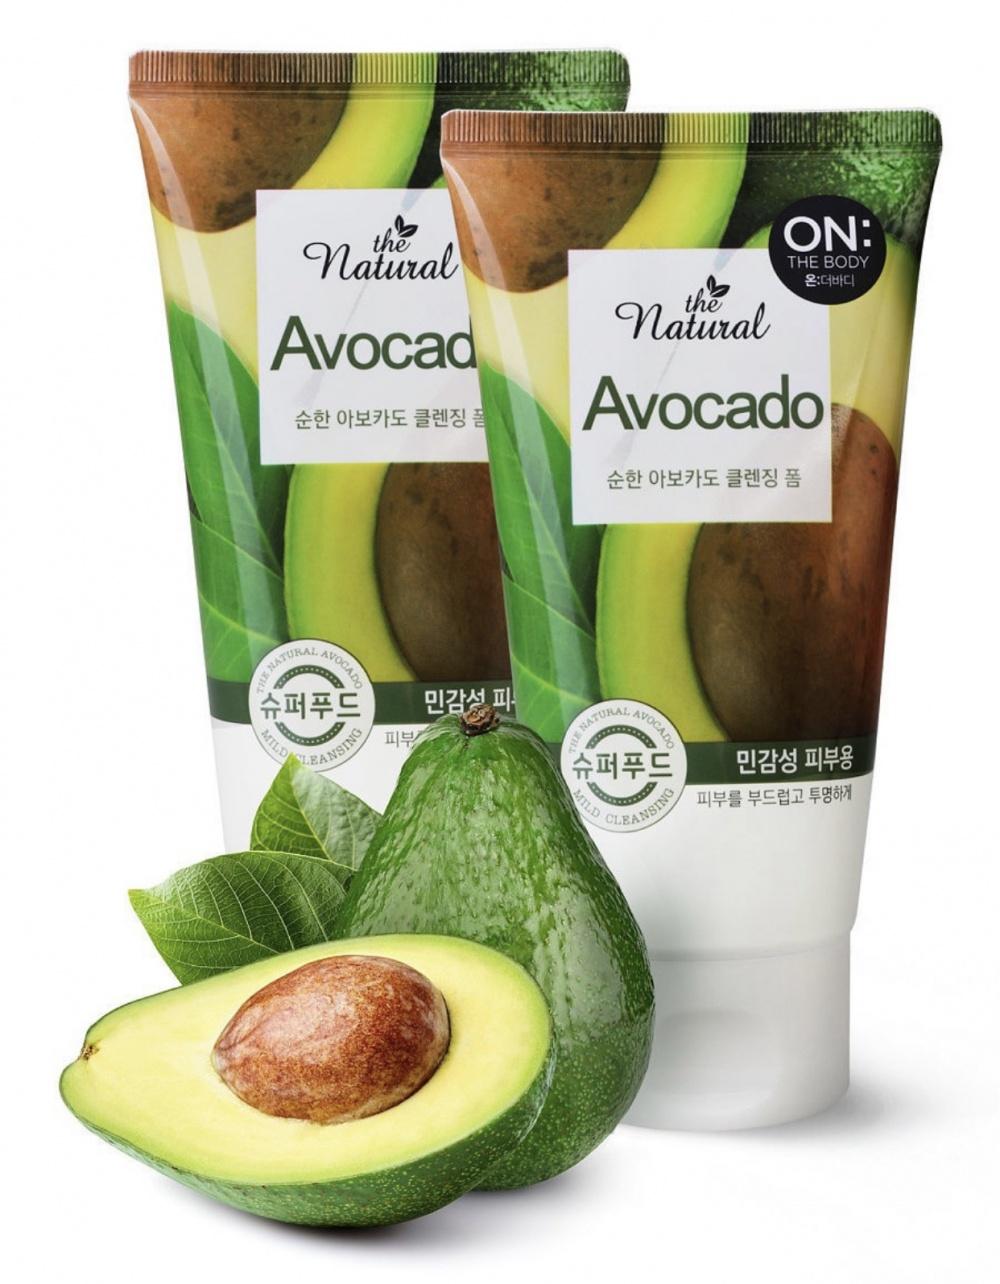 Лот Пенки для умывания On: The Body Natural Avocado, 120гр